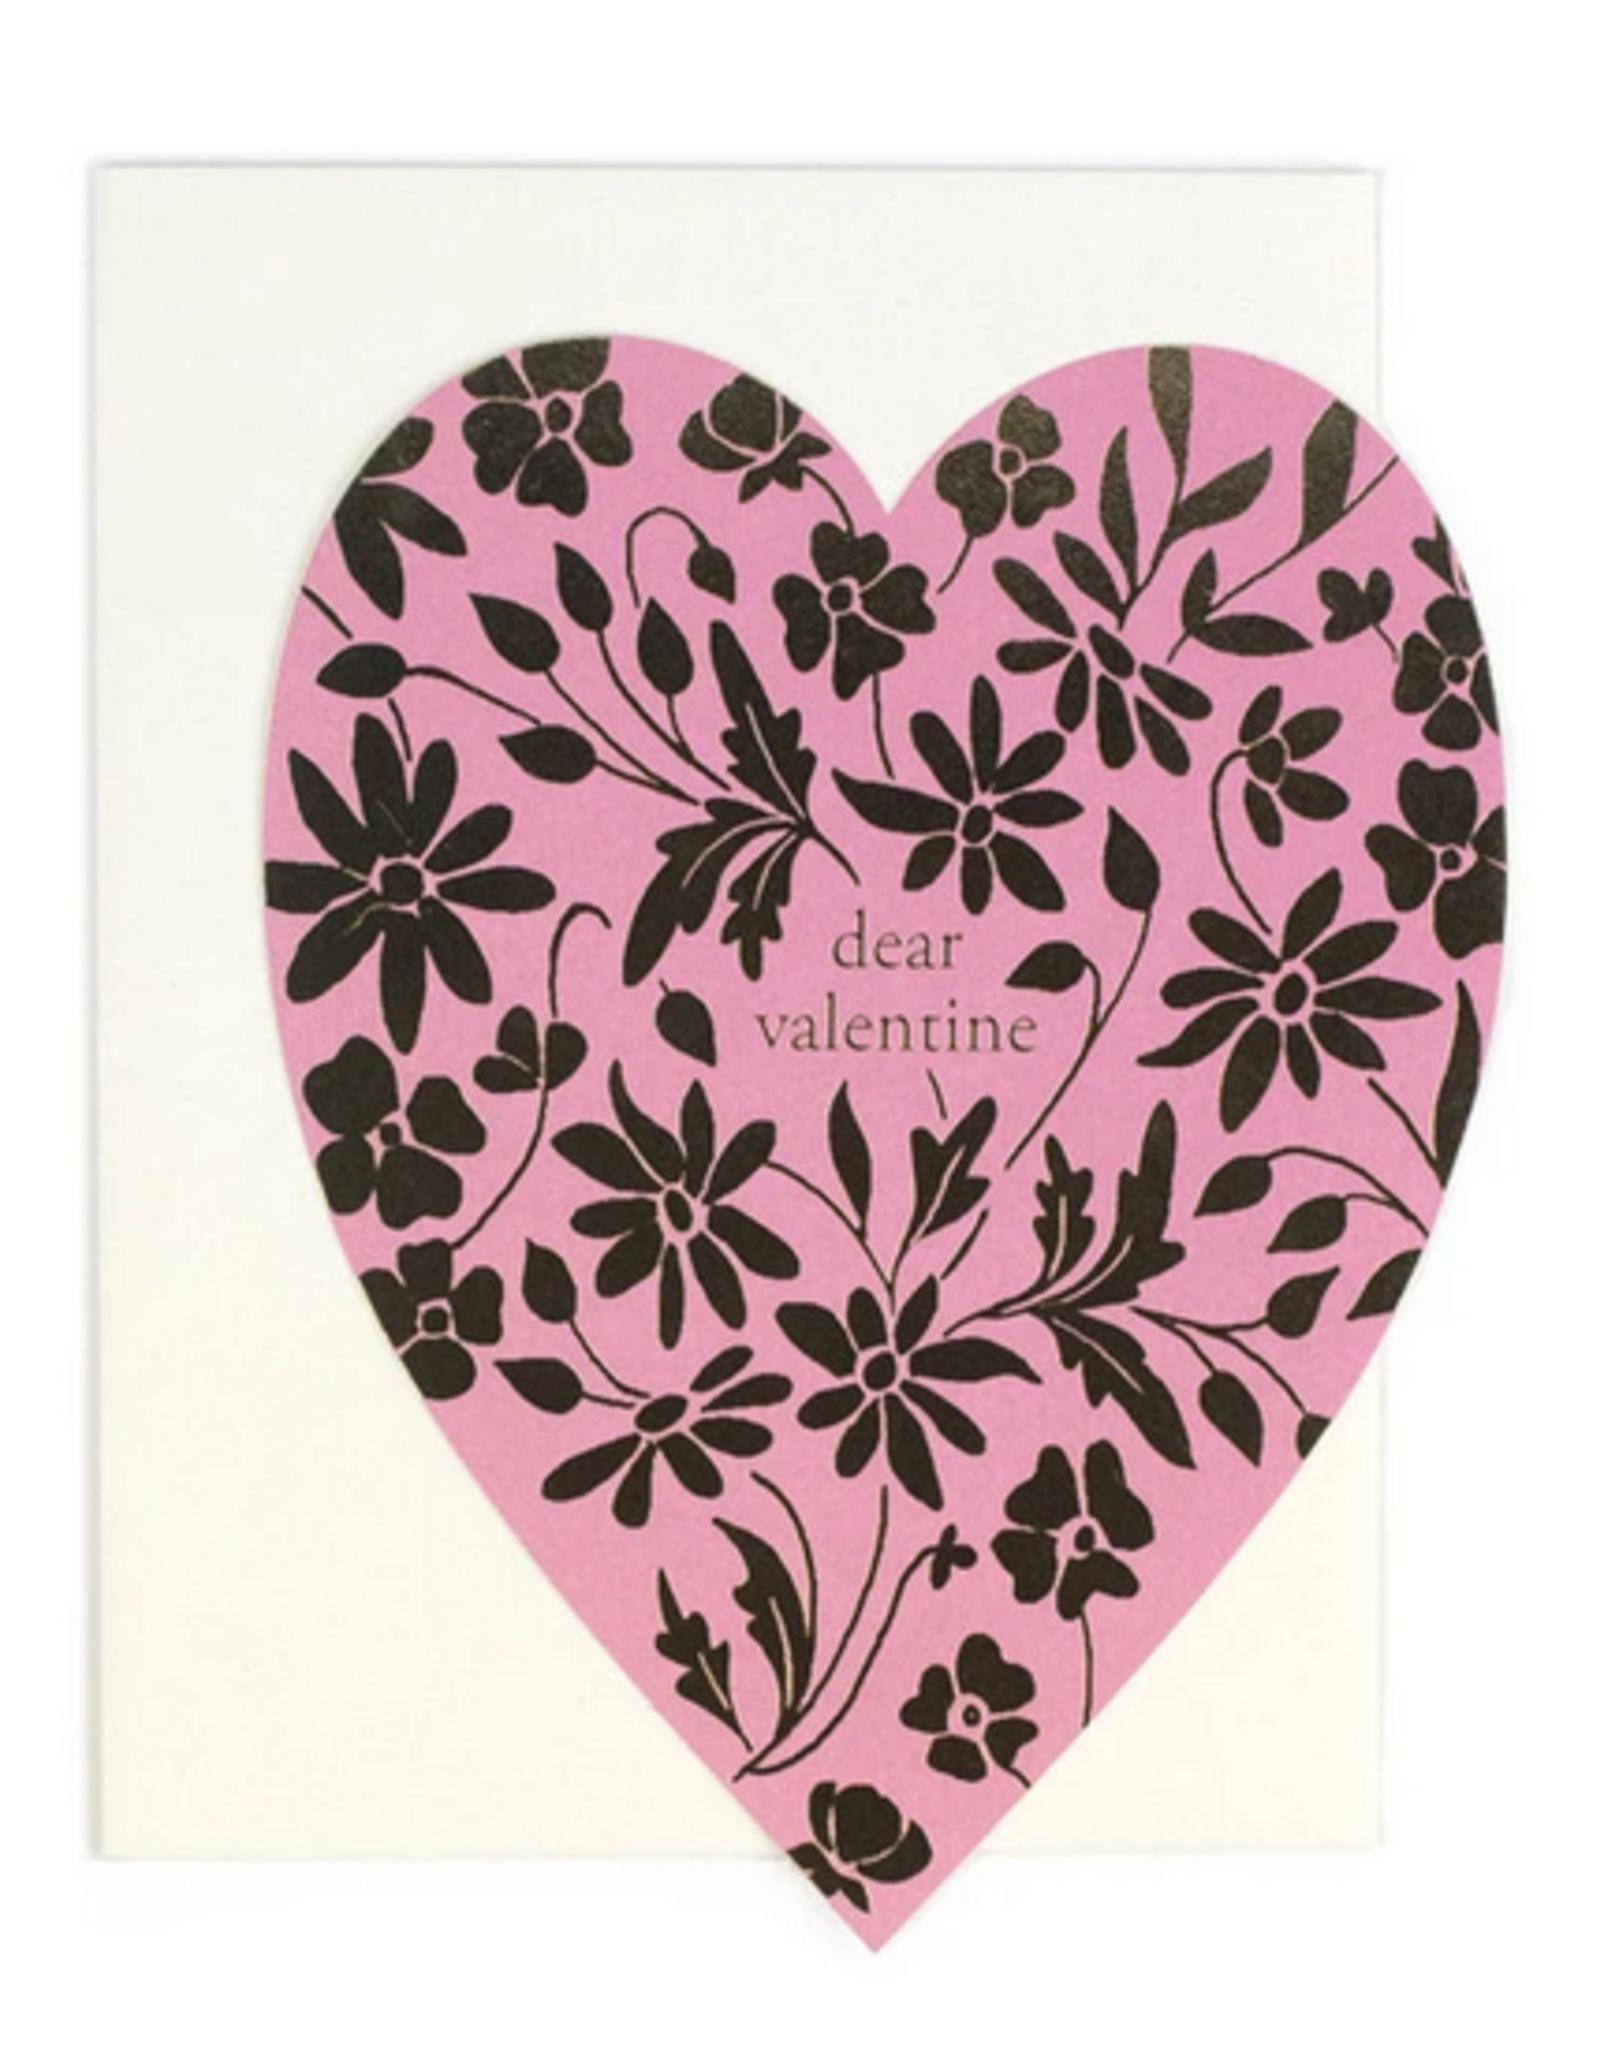 Dear Valentine Heart Greeting Card